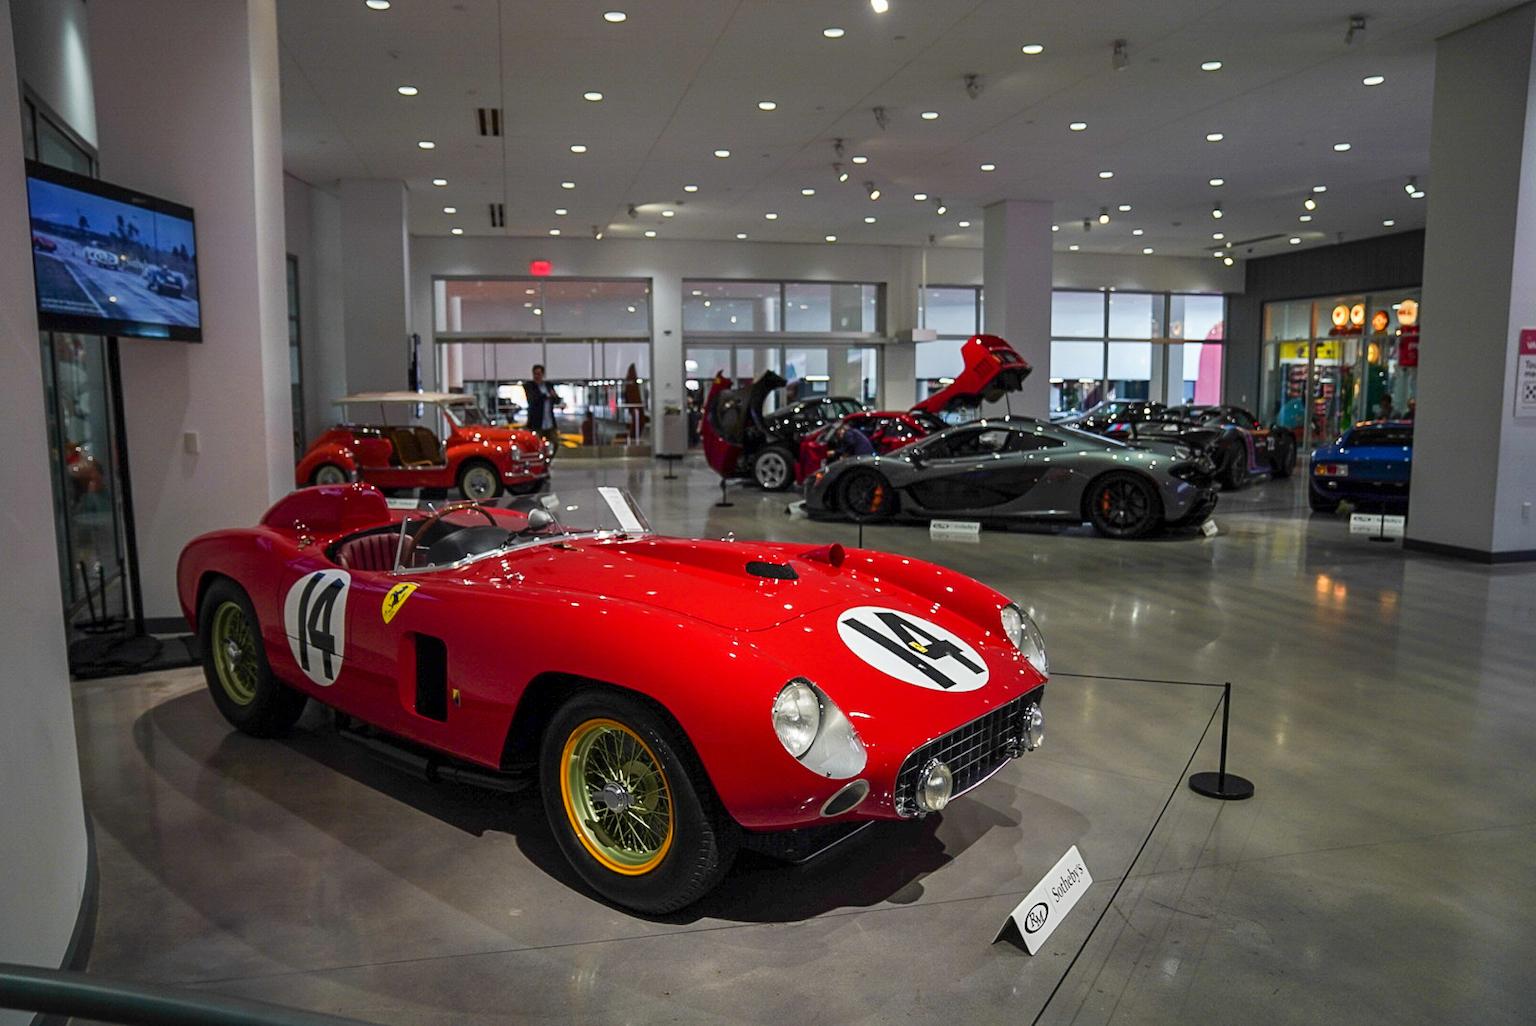 Ferrari 290 MM Sells for $22m at RM Sotheby's Petersen Automotive Museum Sale